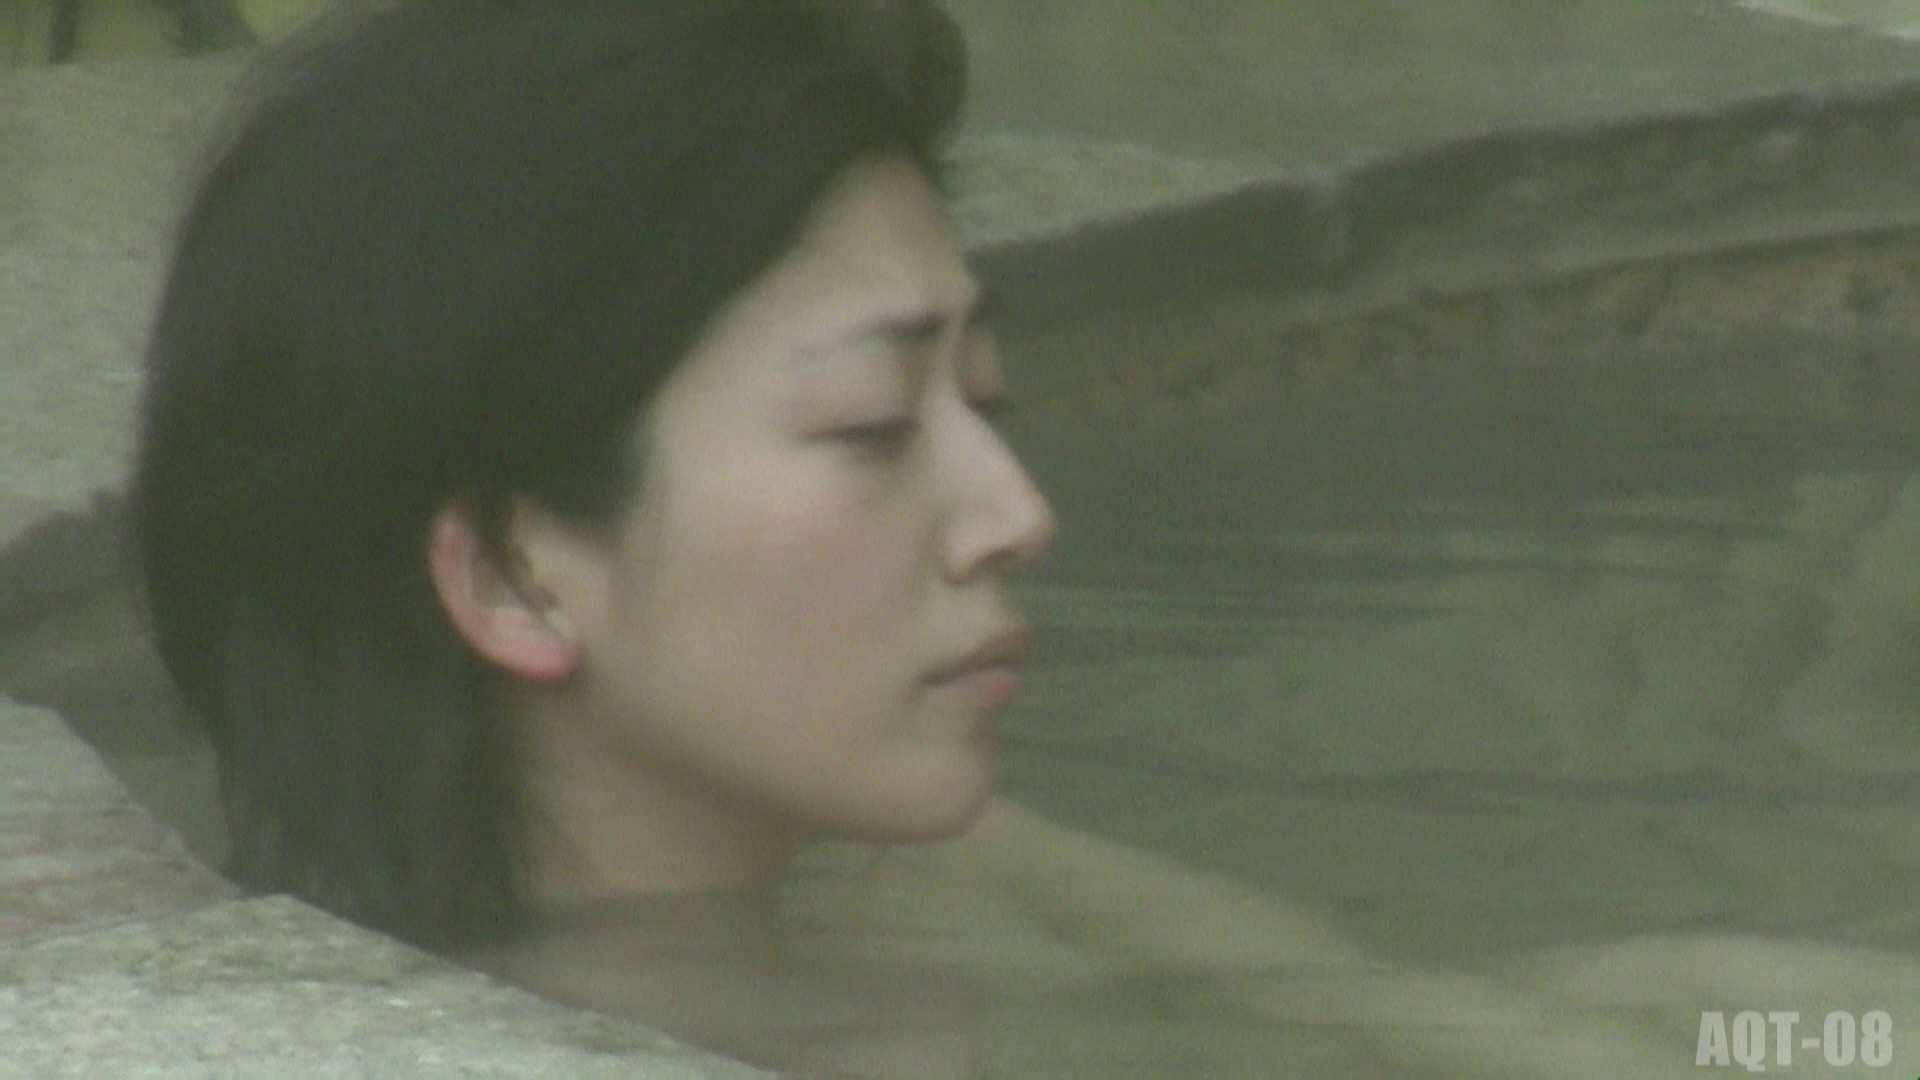 Aquaな露天風呂Vol.776 盗撮 エロ無料画像 108画像 47